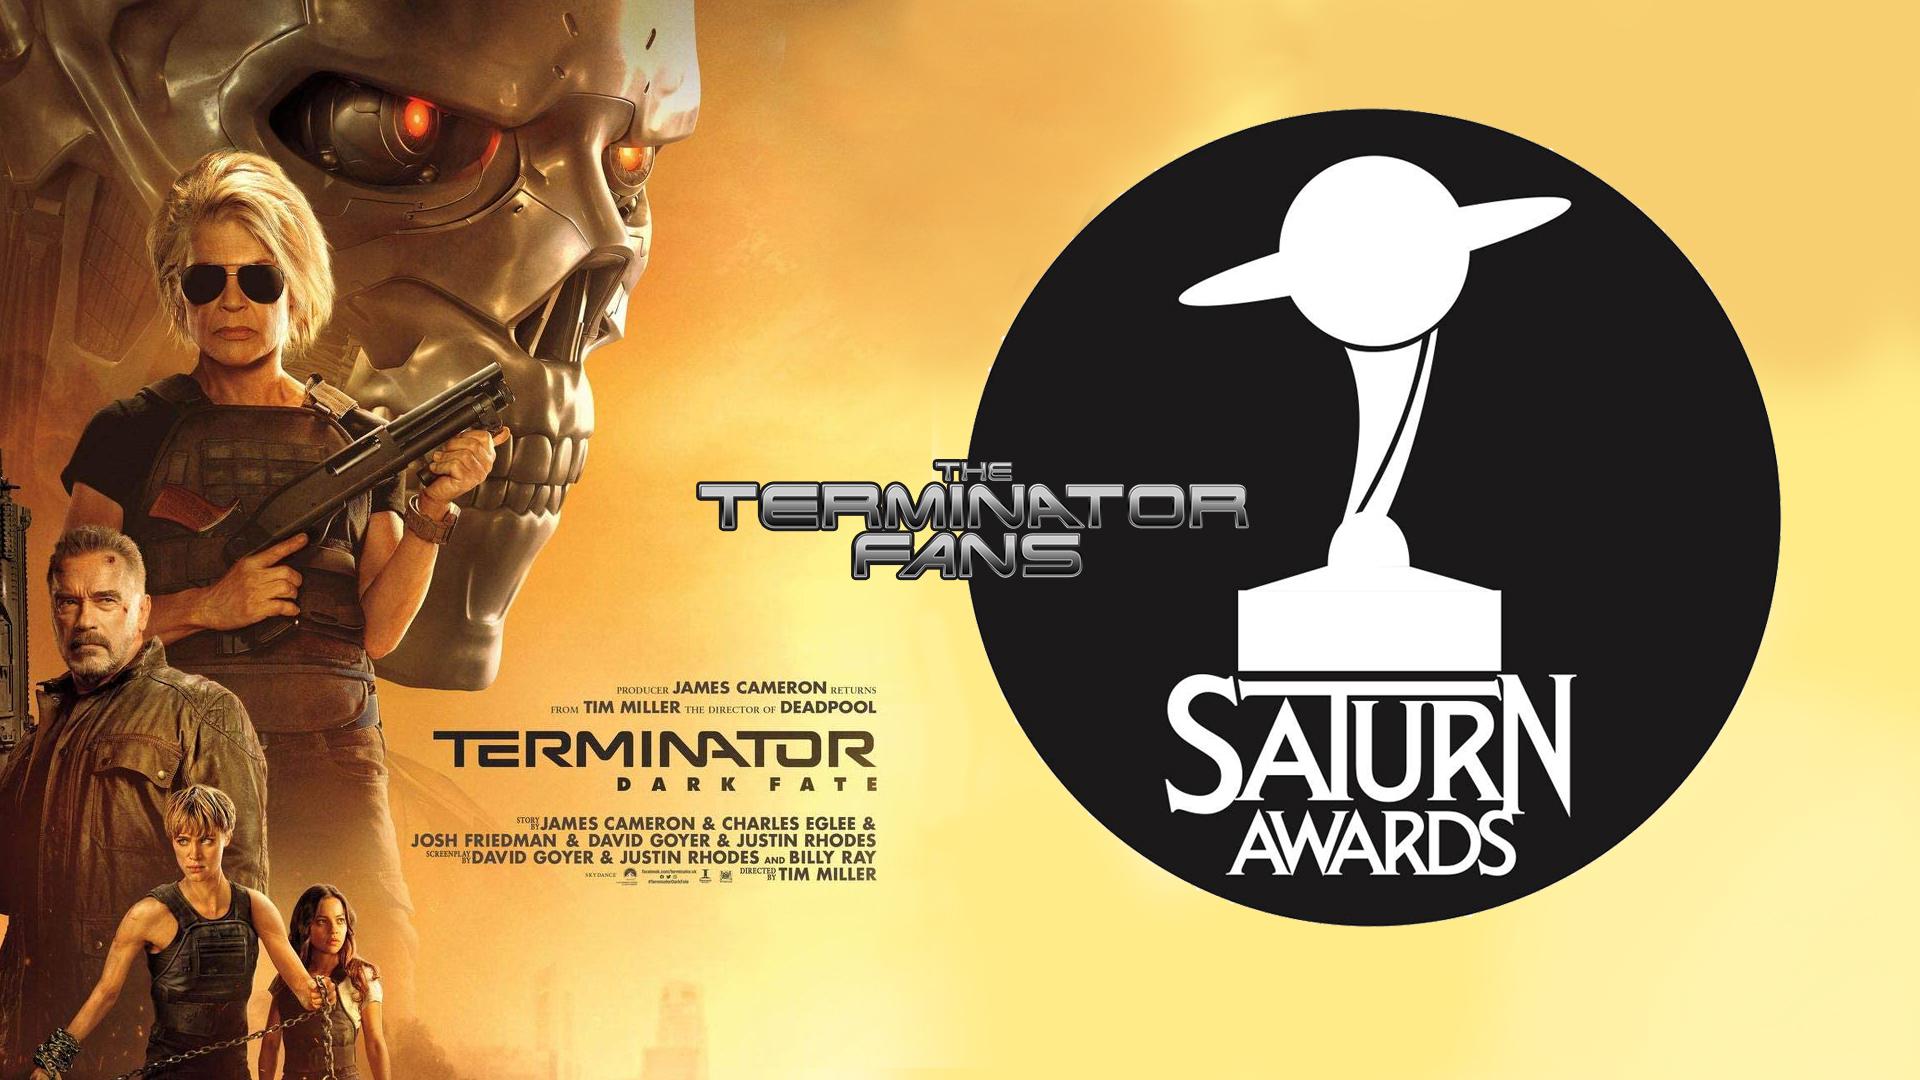 Saturn Awards | Terminator: Dark Fate Best Science Fiction Film Release Nomination